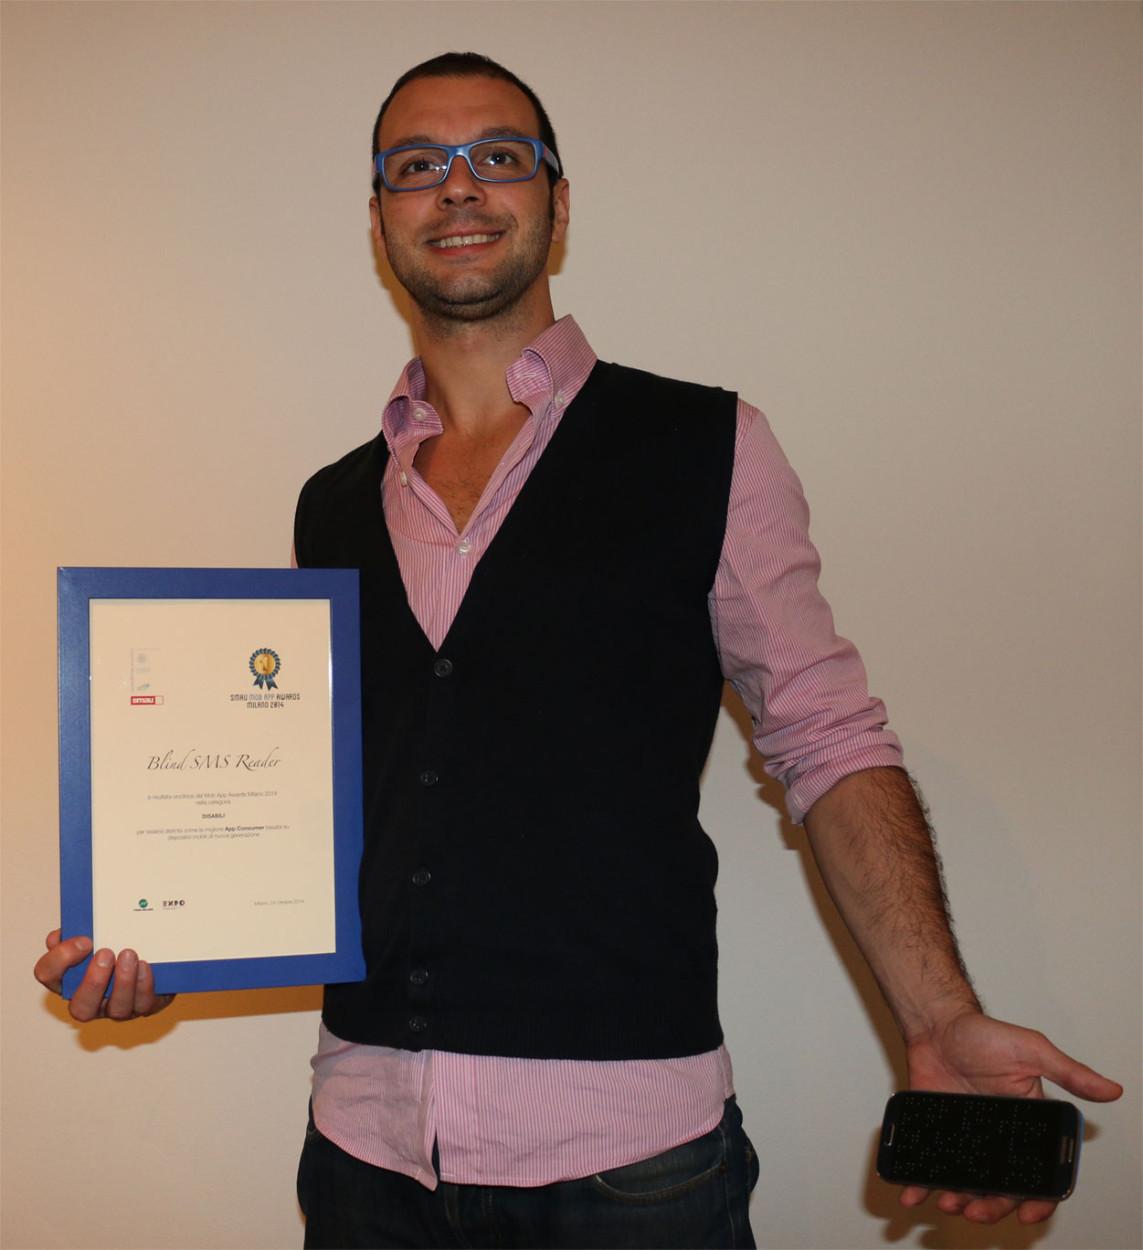 SMAU - Michele Pisani vince al Mob App Awards con Blind SMS Reader